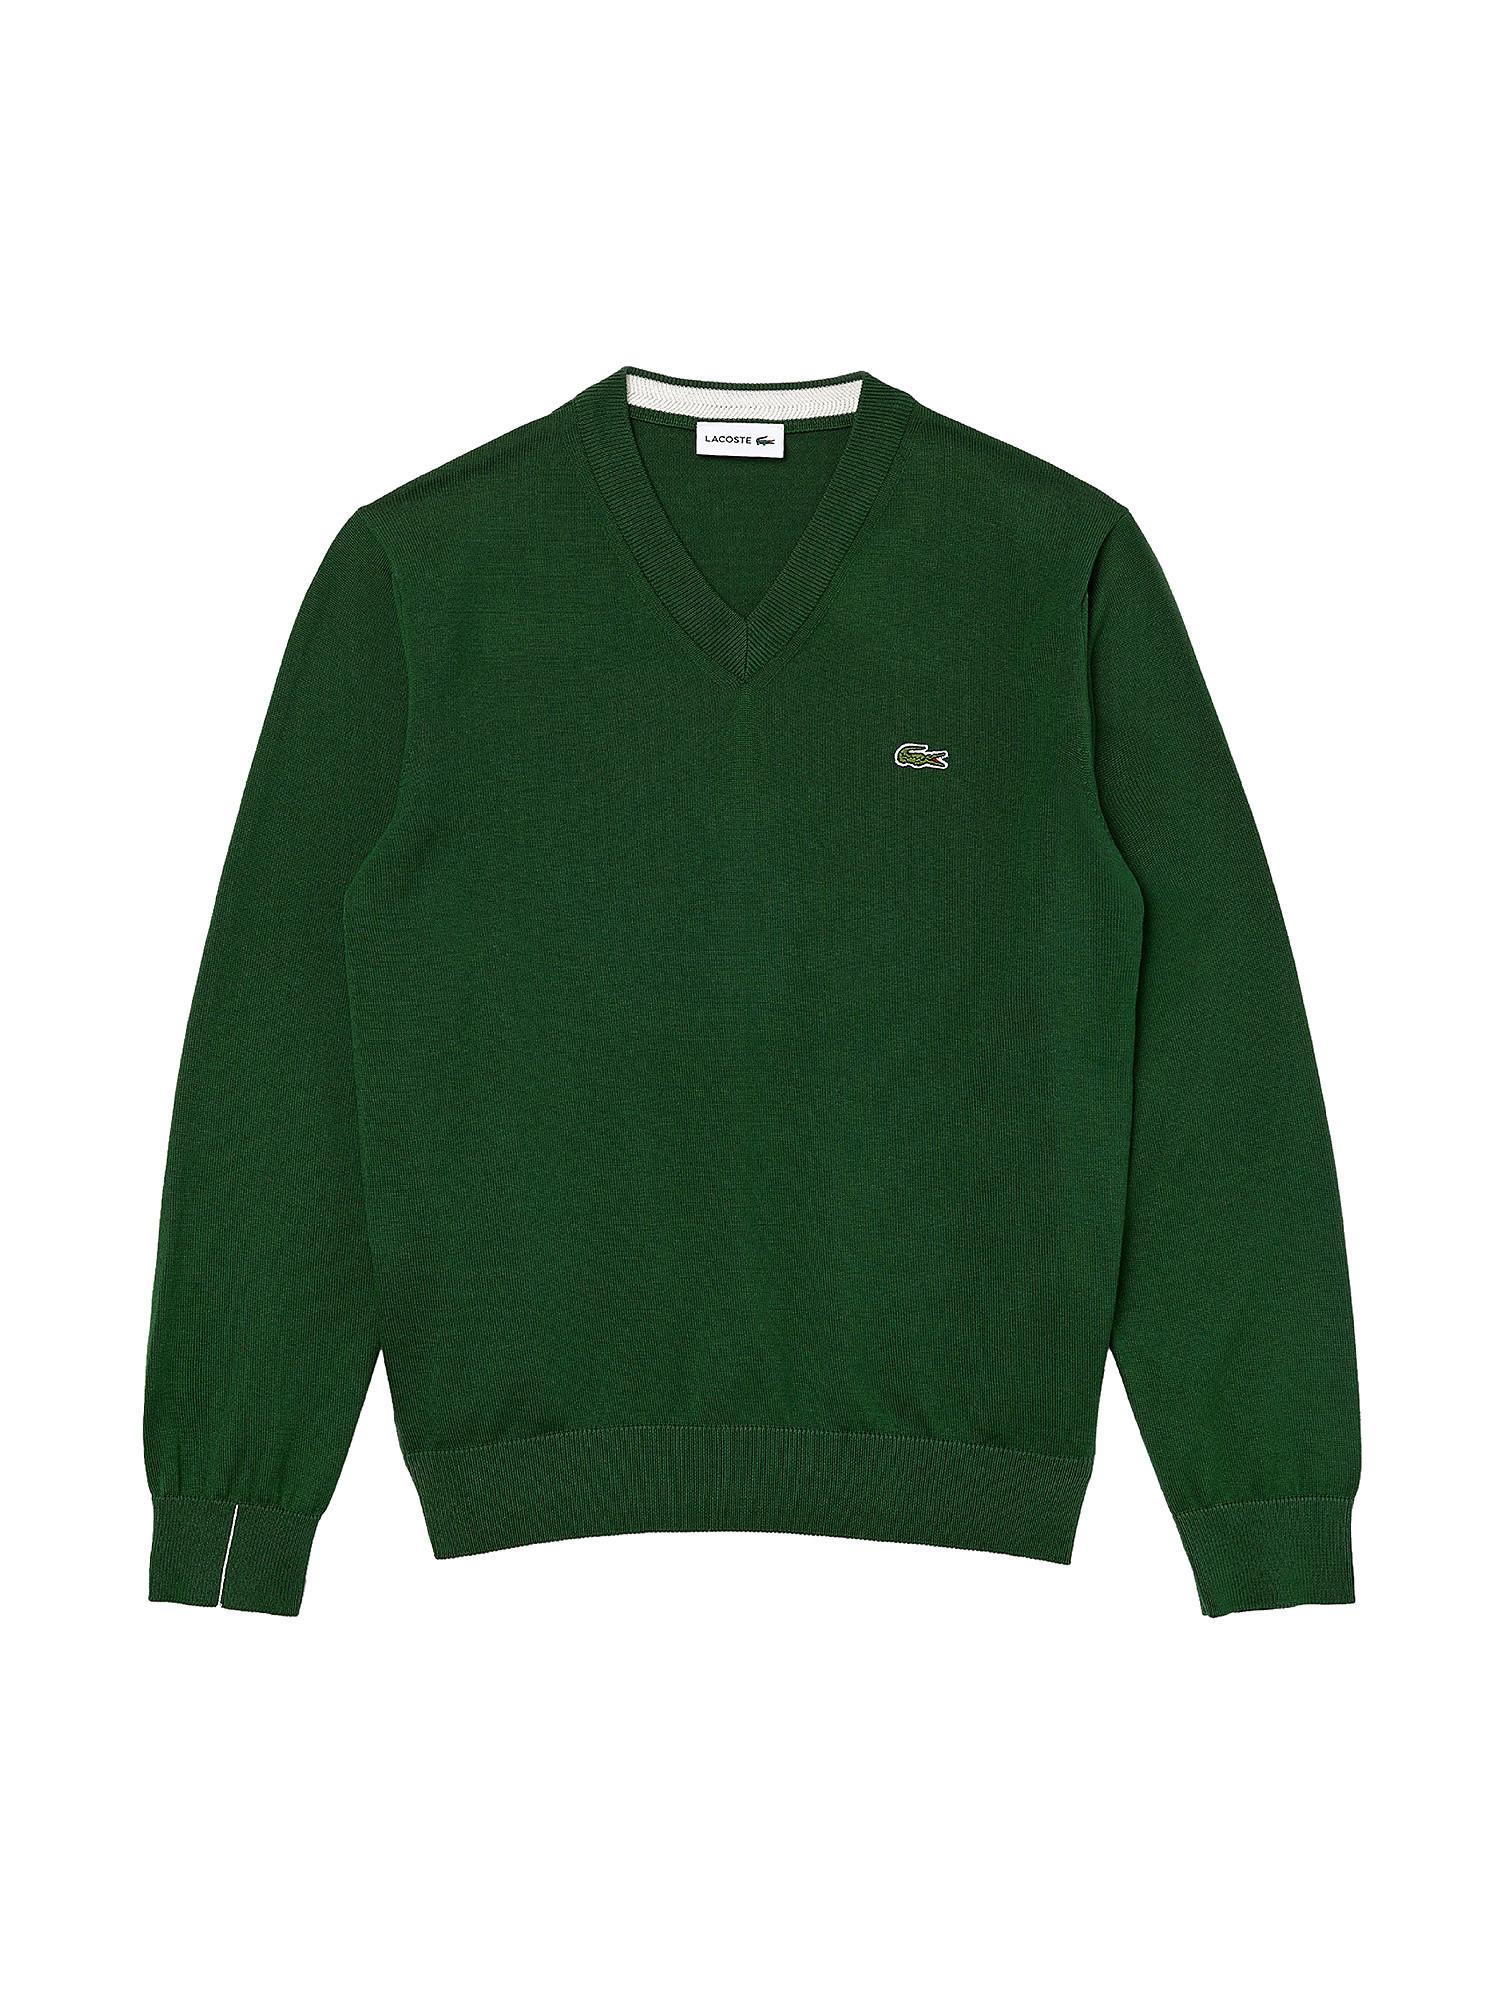 Pullover uomo scollo a V in cotone, Verde, large image number 0